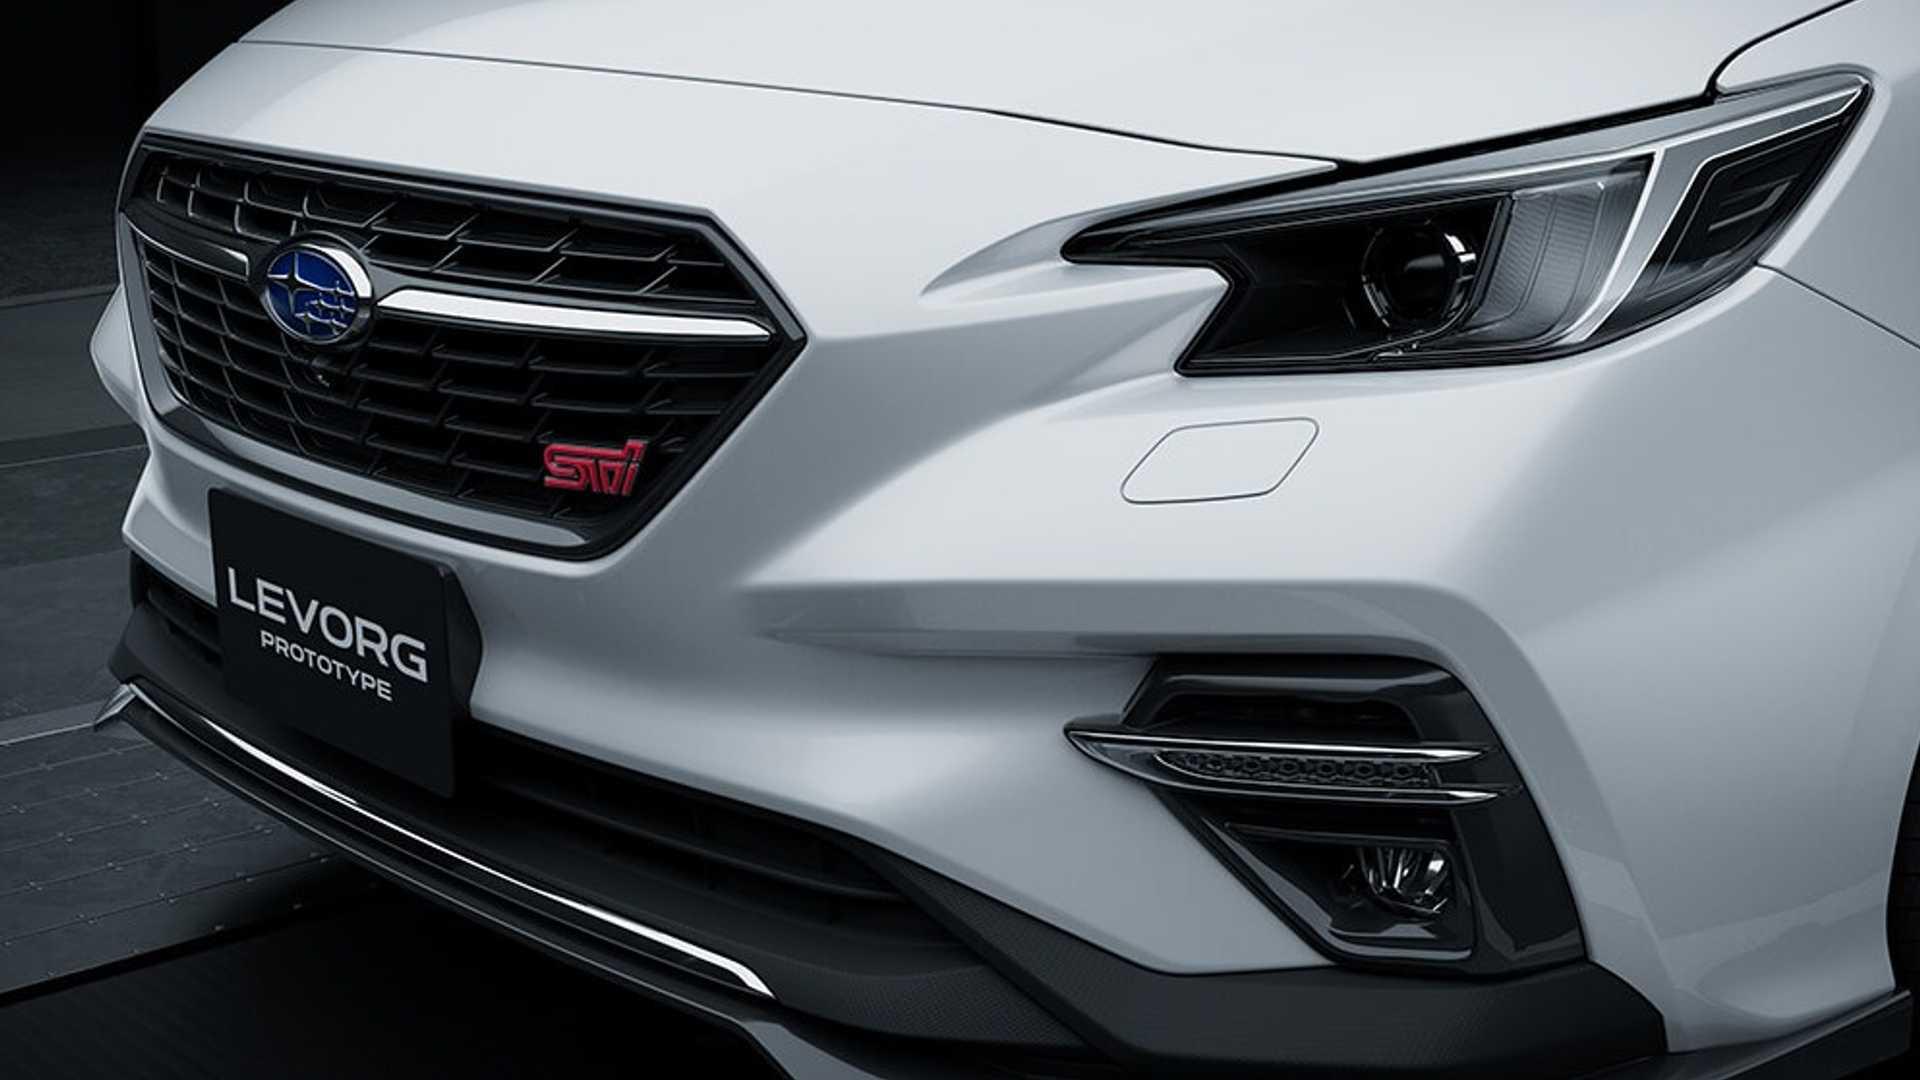 Subaru-Levorg-STI-Sport-Prototype-10